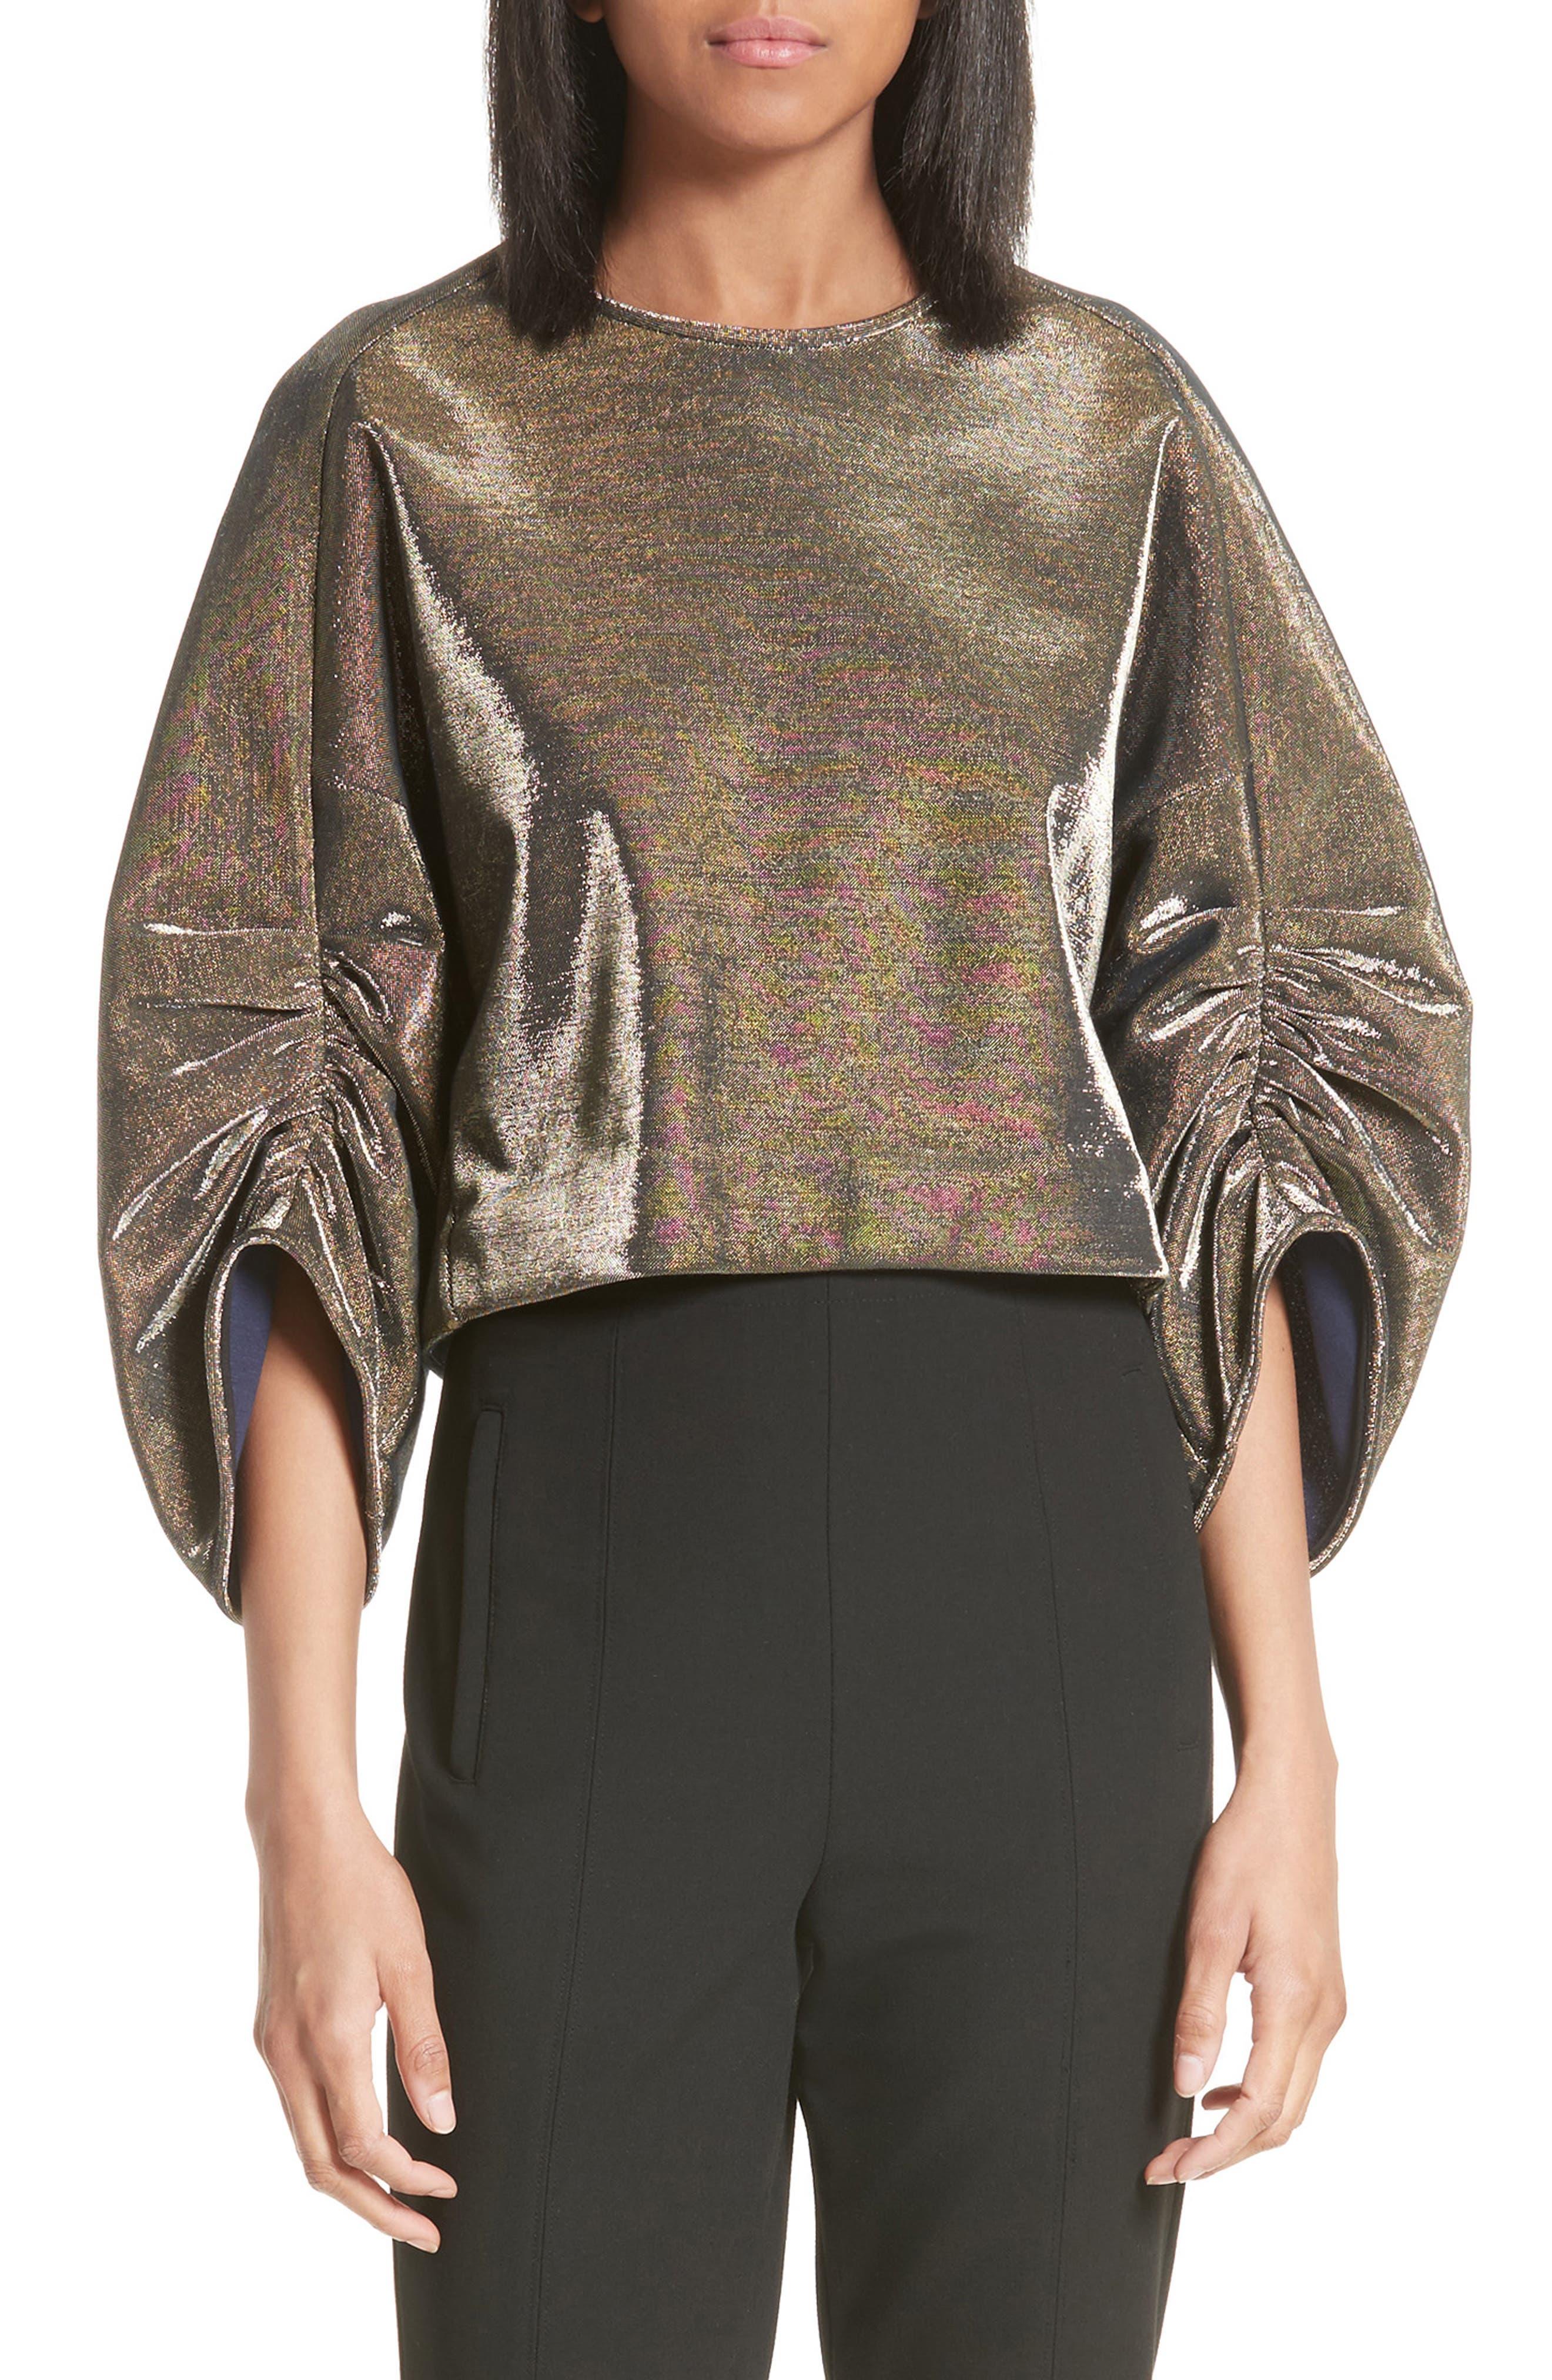 Tibi Ruched Sleeve Metallic Top